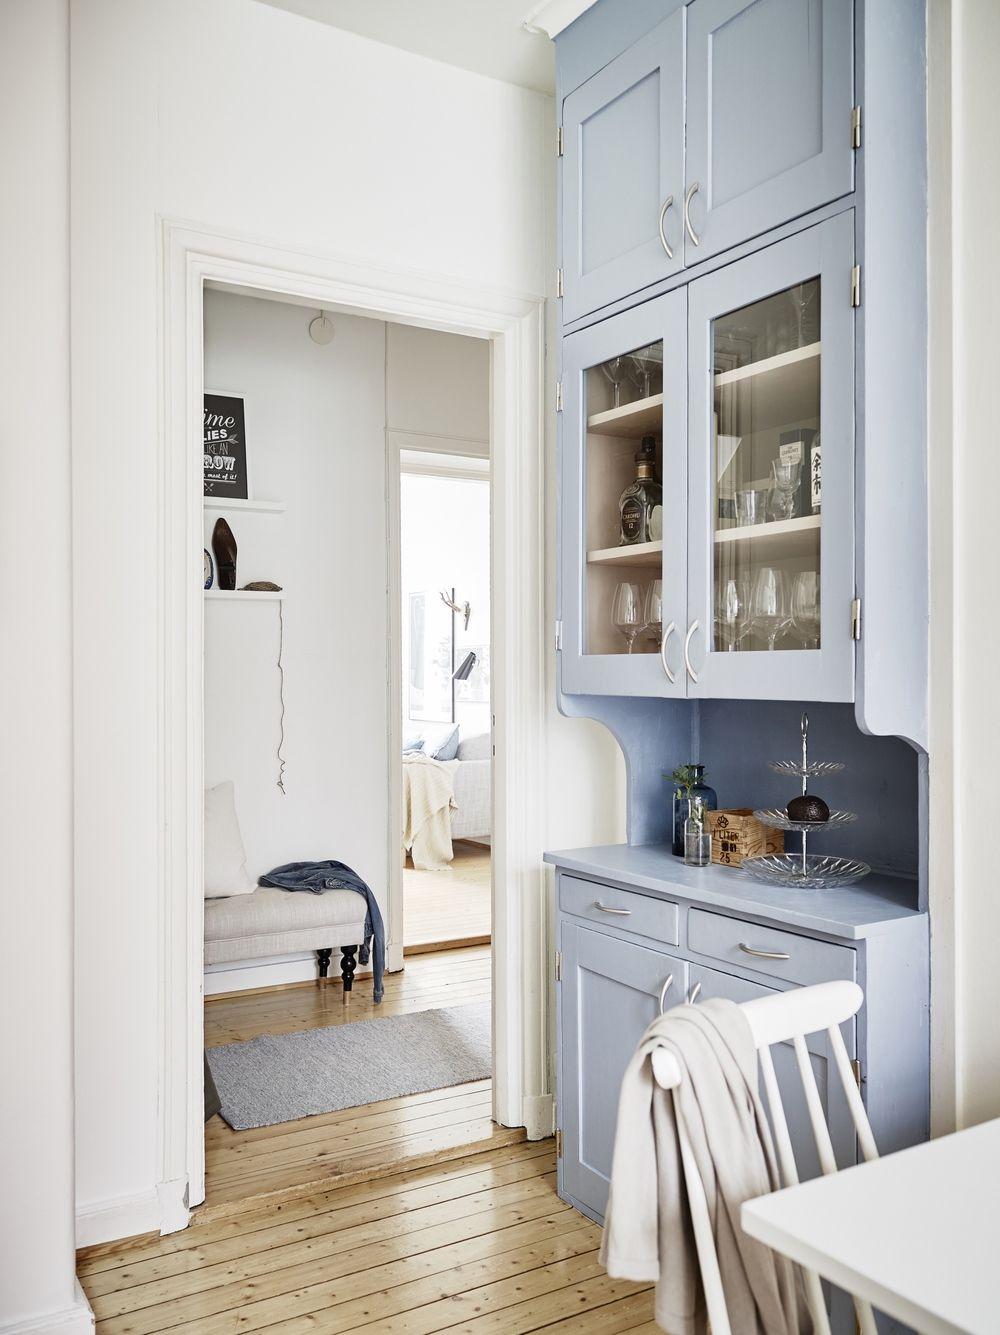 Lovely spring Scandinavian interior | ik ben ijsthee blog